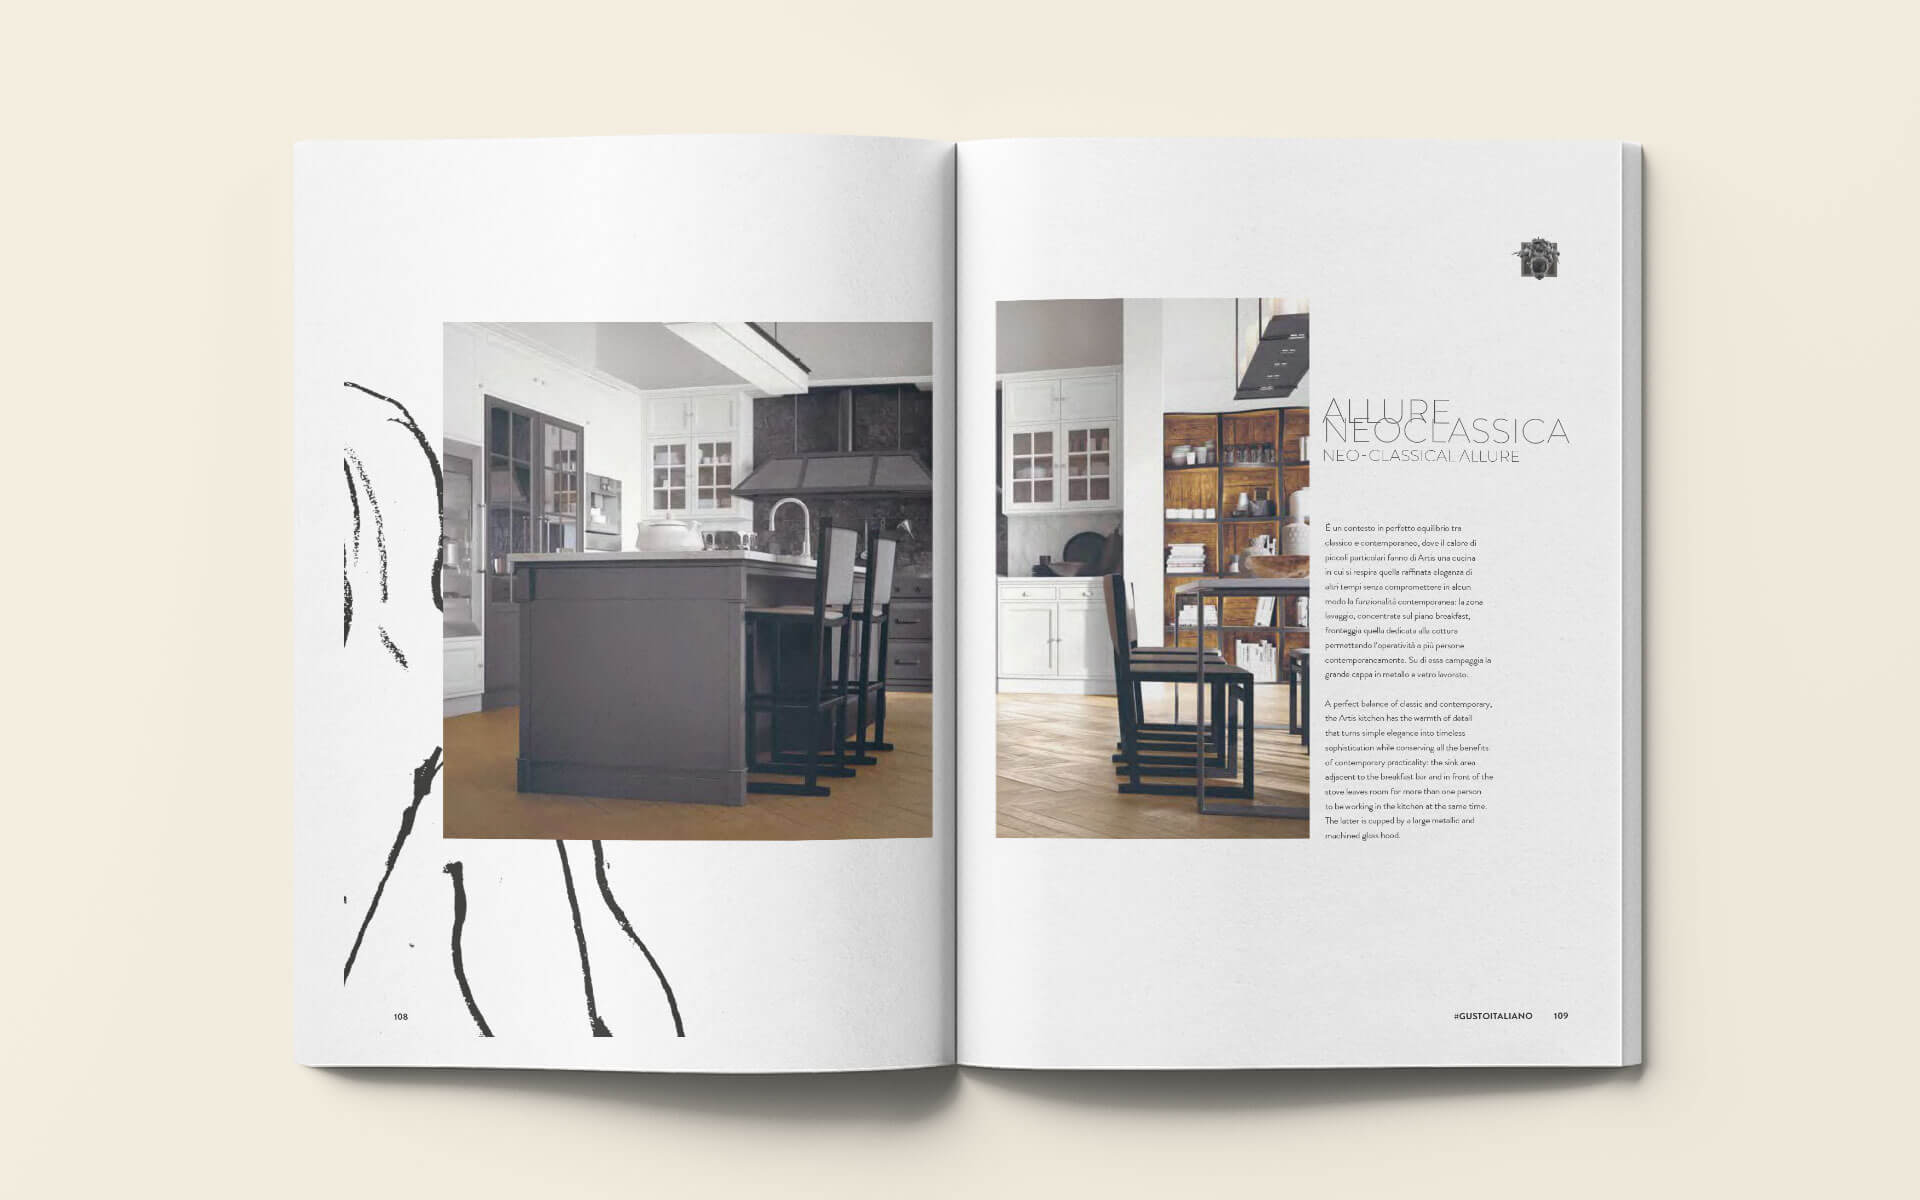 Catalogo Artis - Marchi Cucine Made in Italy